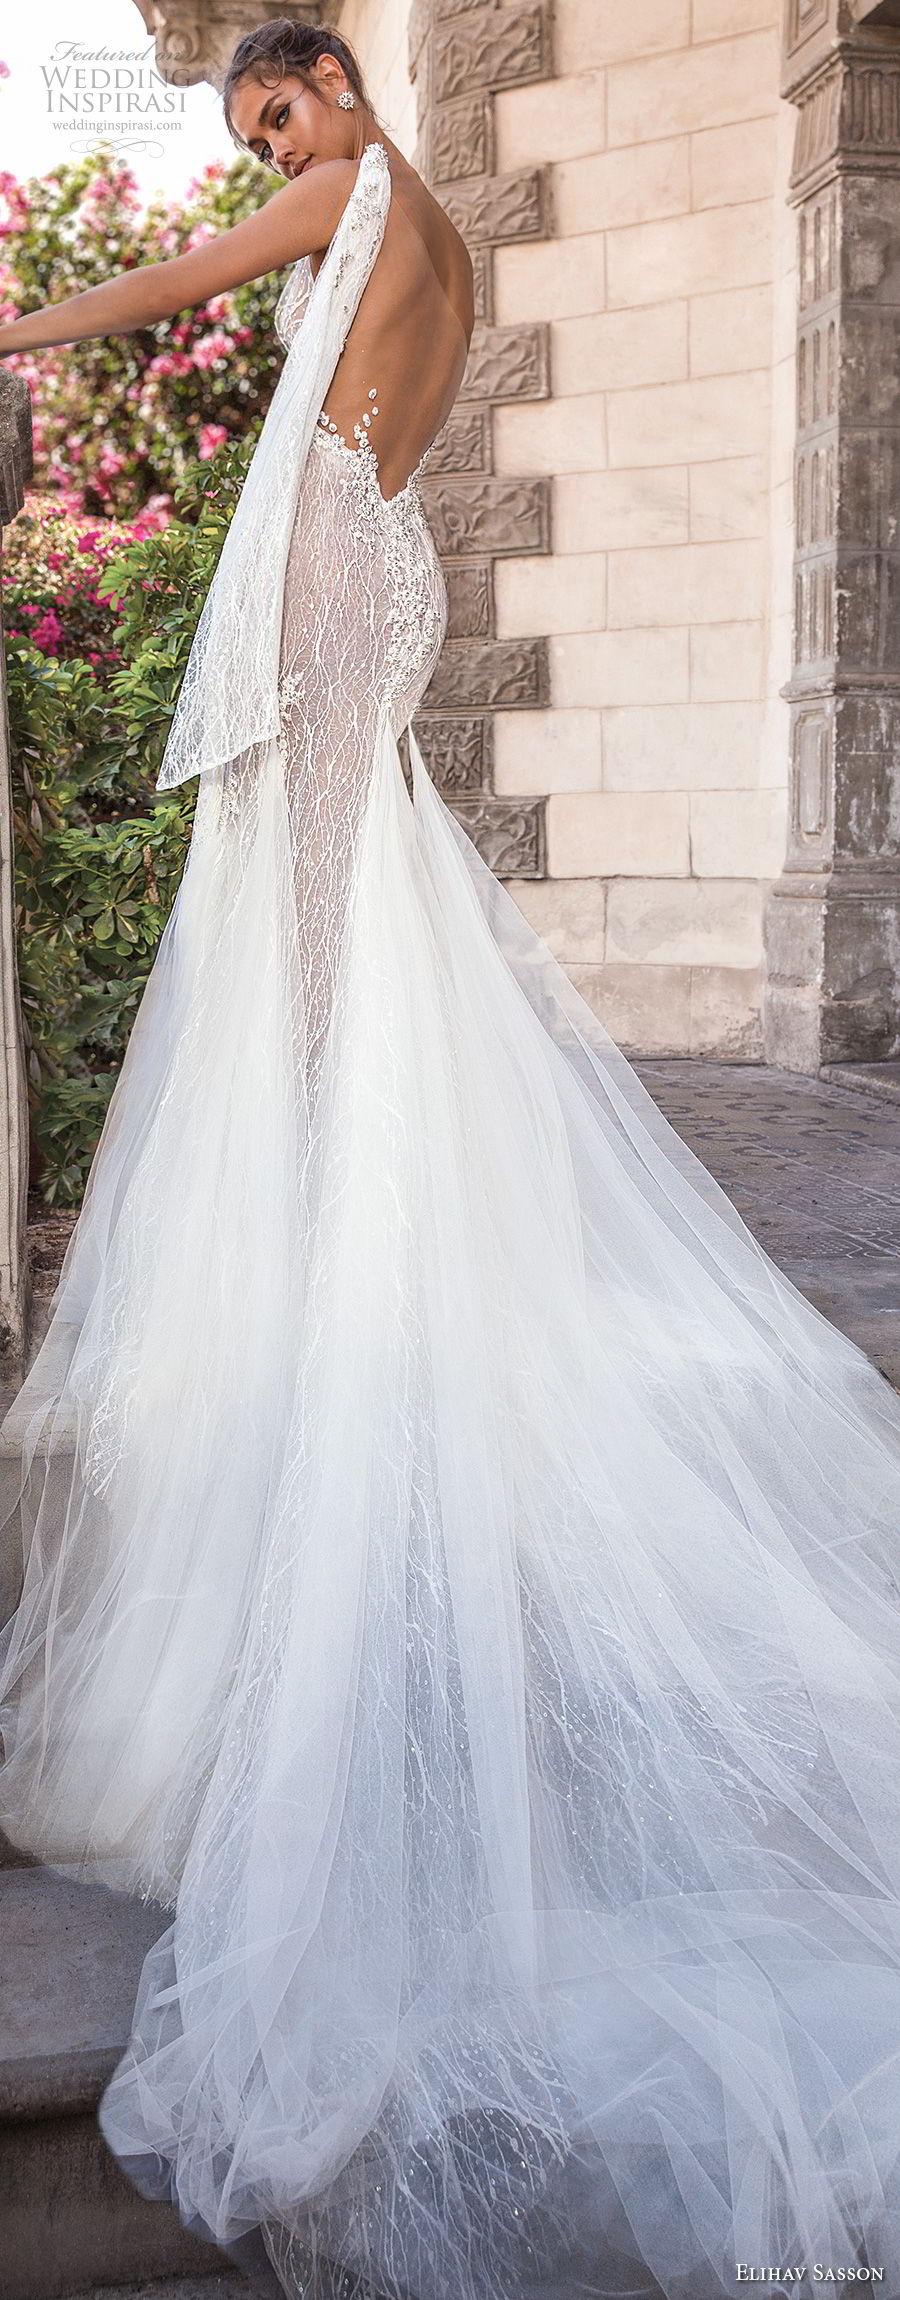 elihav sasson 2018 capsule bridal sleeveless one shoulder full embellishment high slit romantic sexy soft a line wedding dress low open back chapel train (2) bv